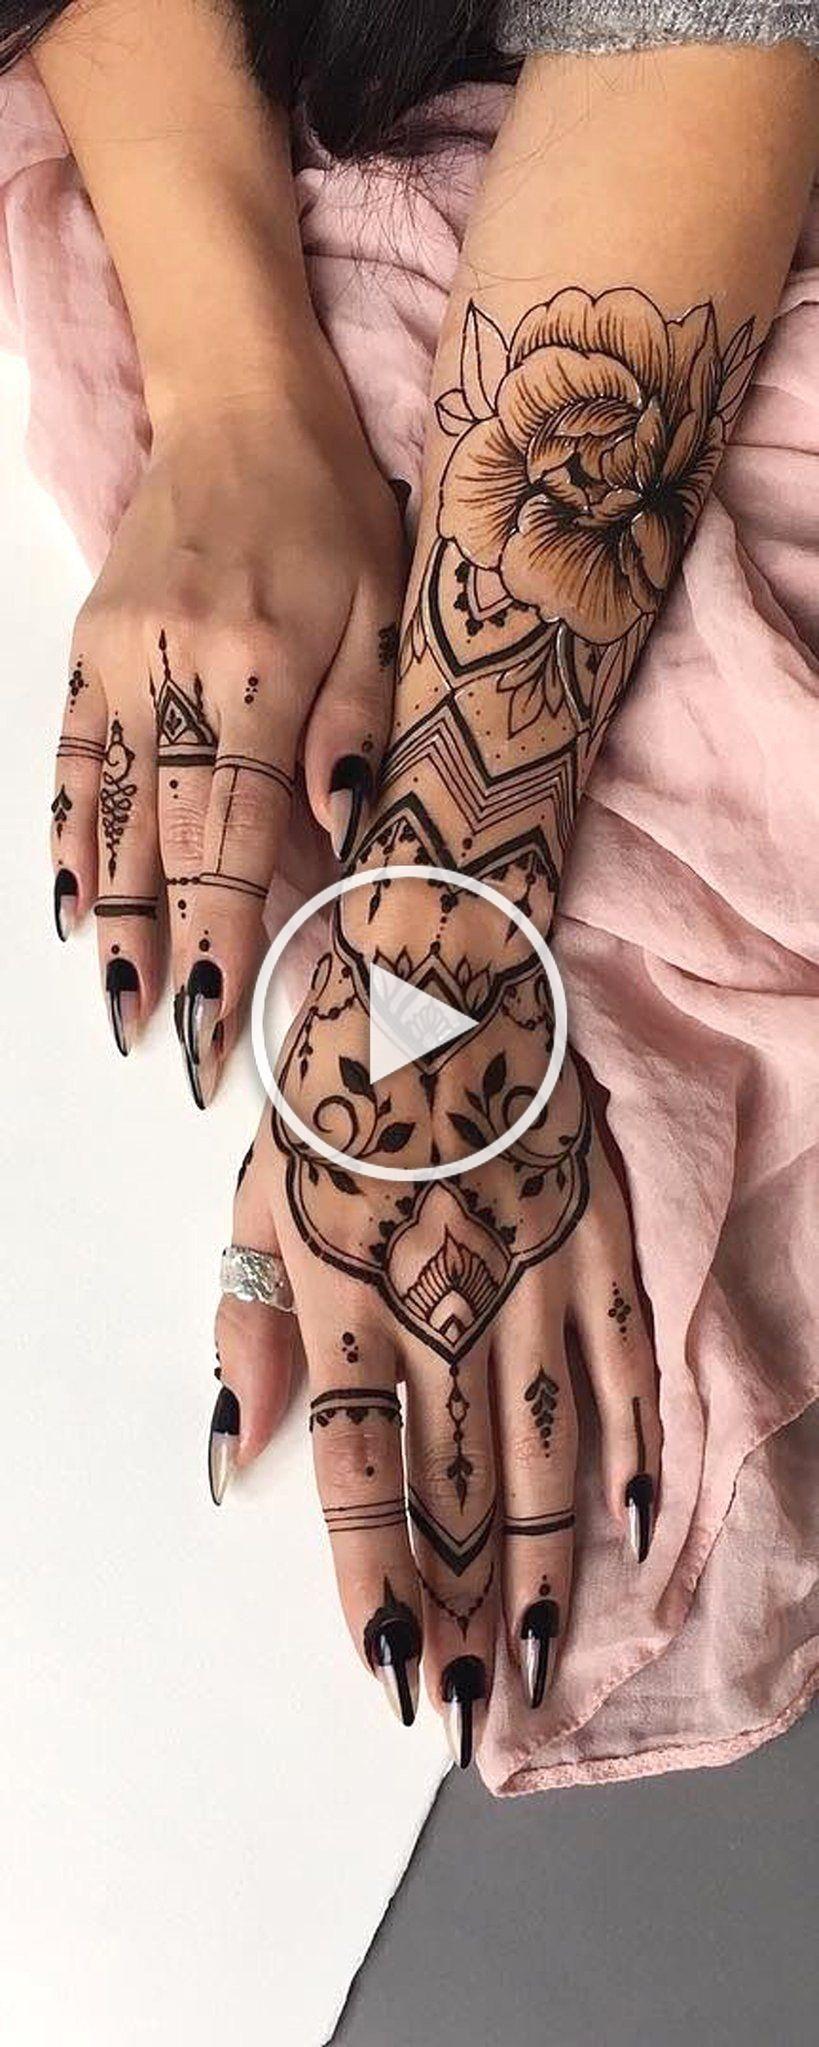 Black henna tribal bohemian hand tattoo ideas for women